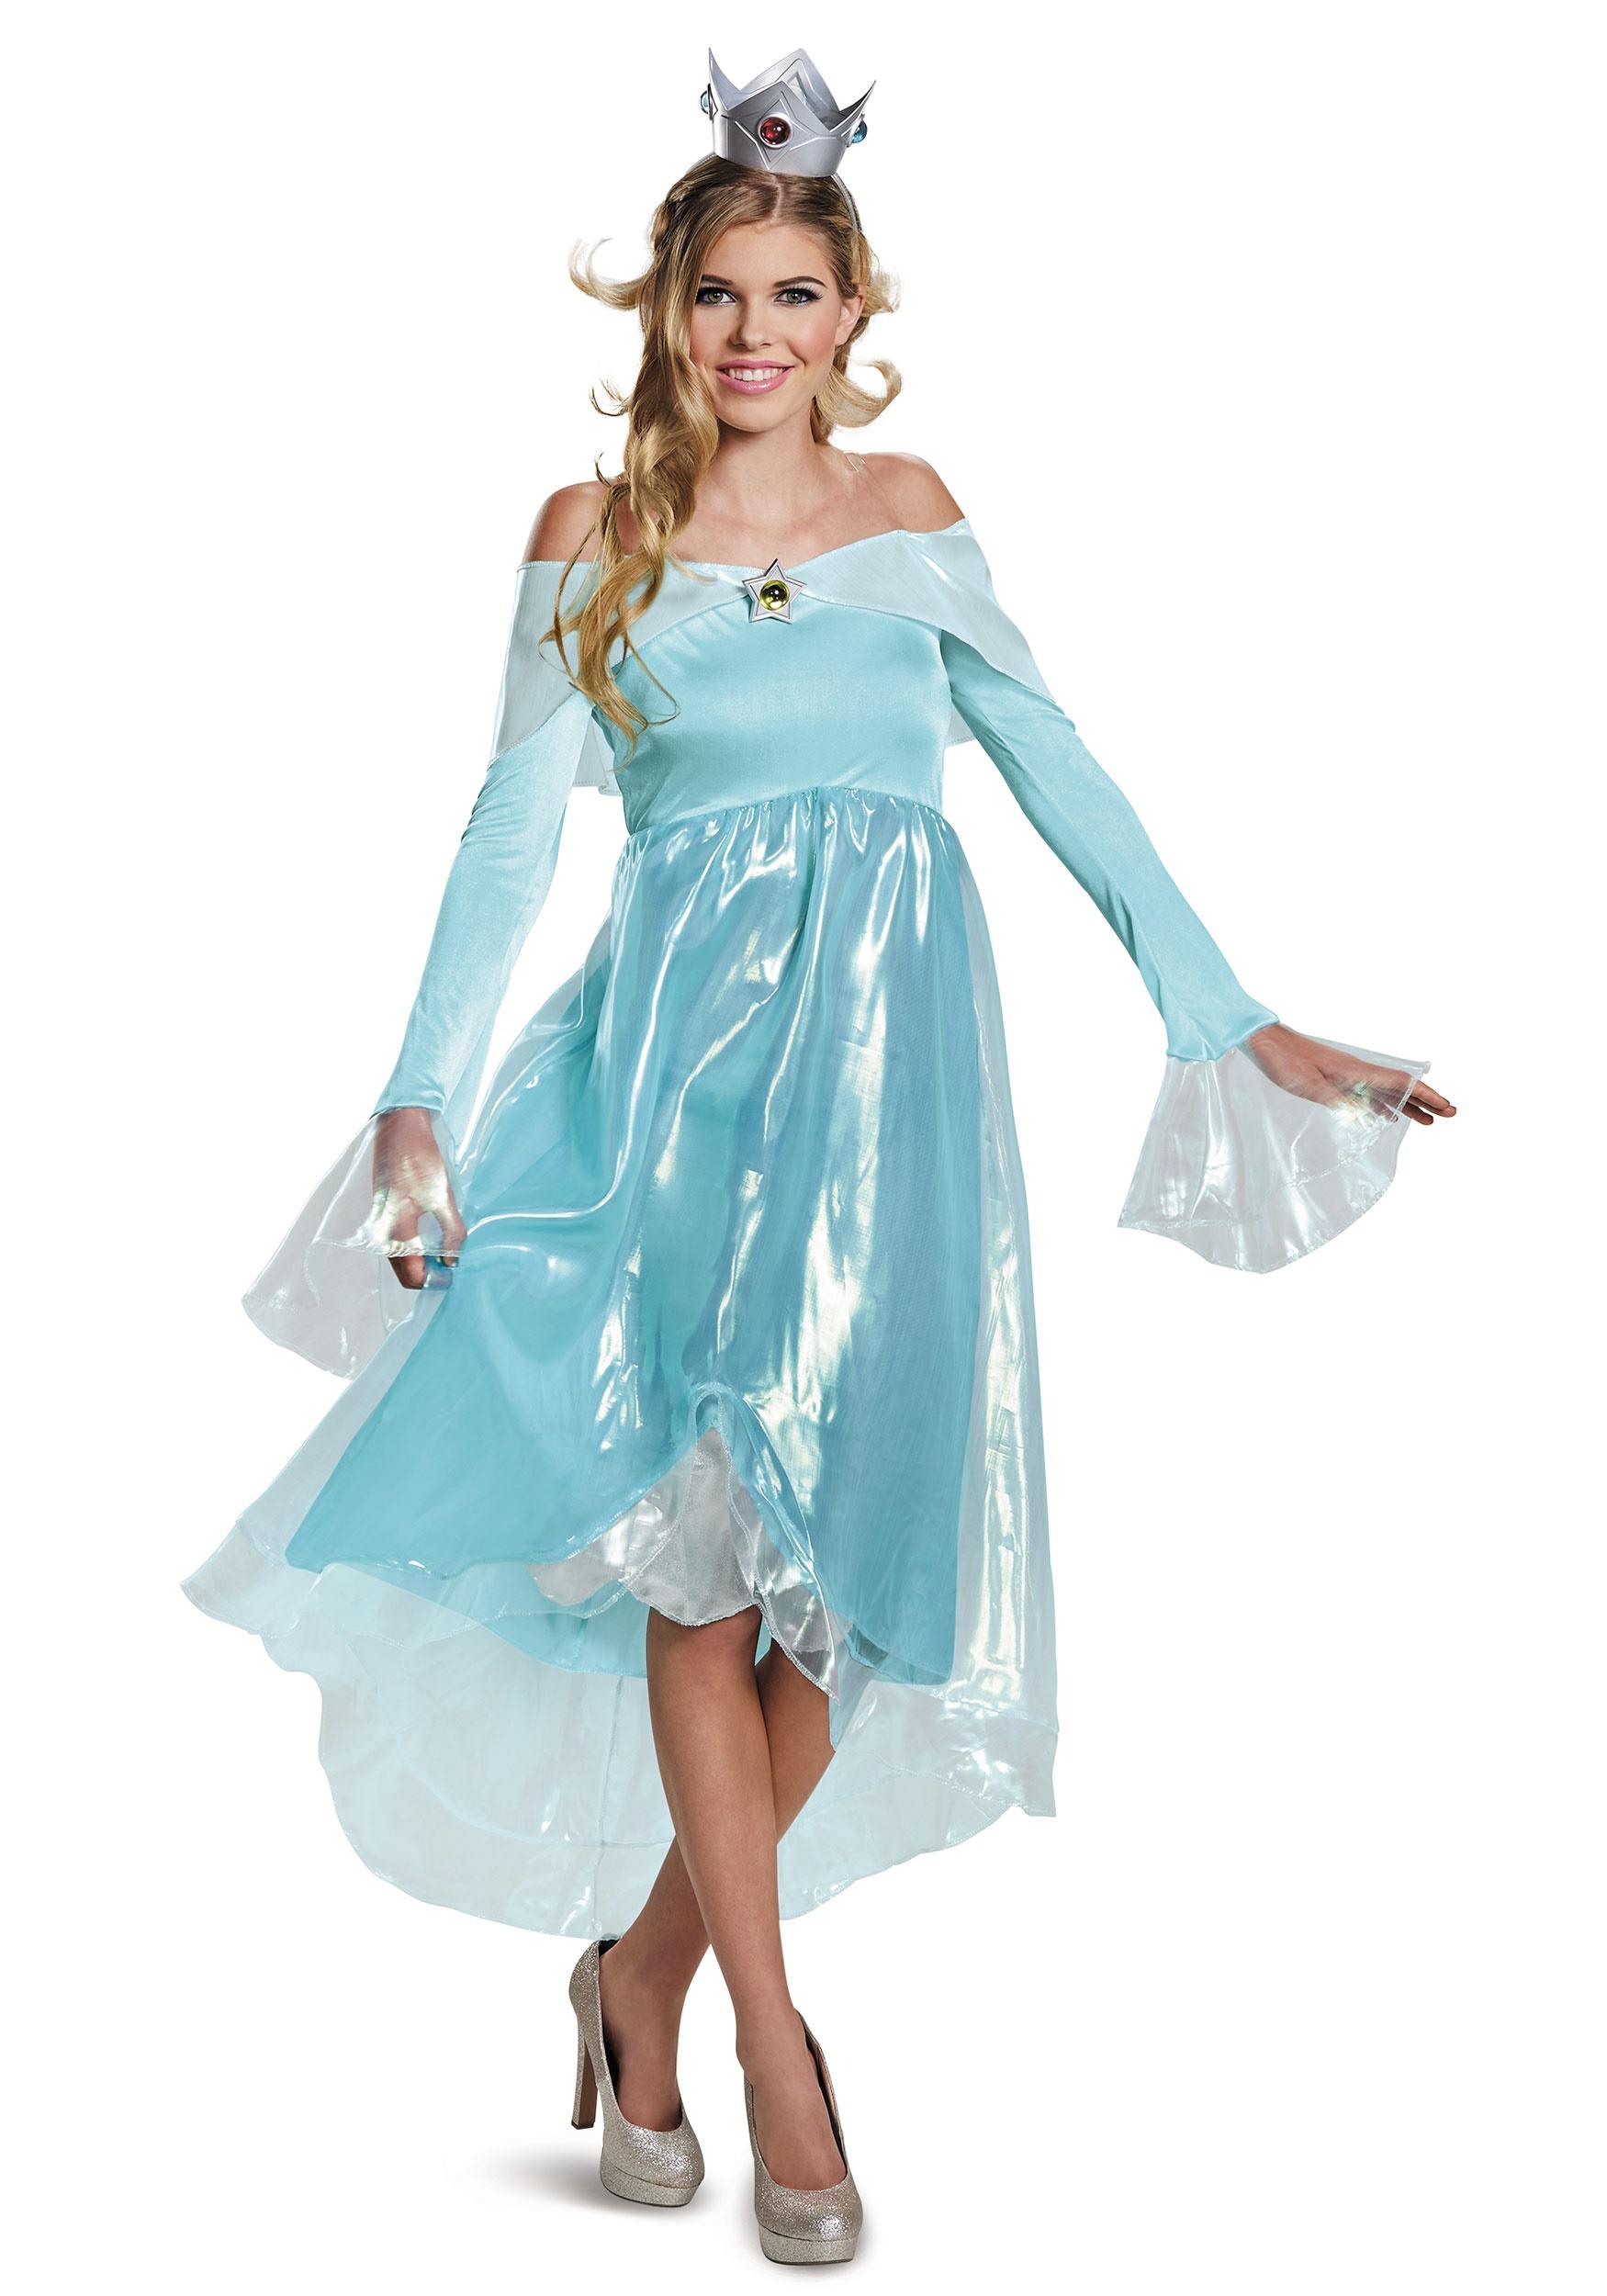 Super Mario Rosalina Deluxe Costume for Women